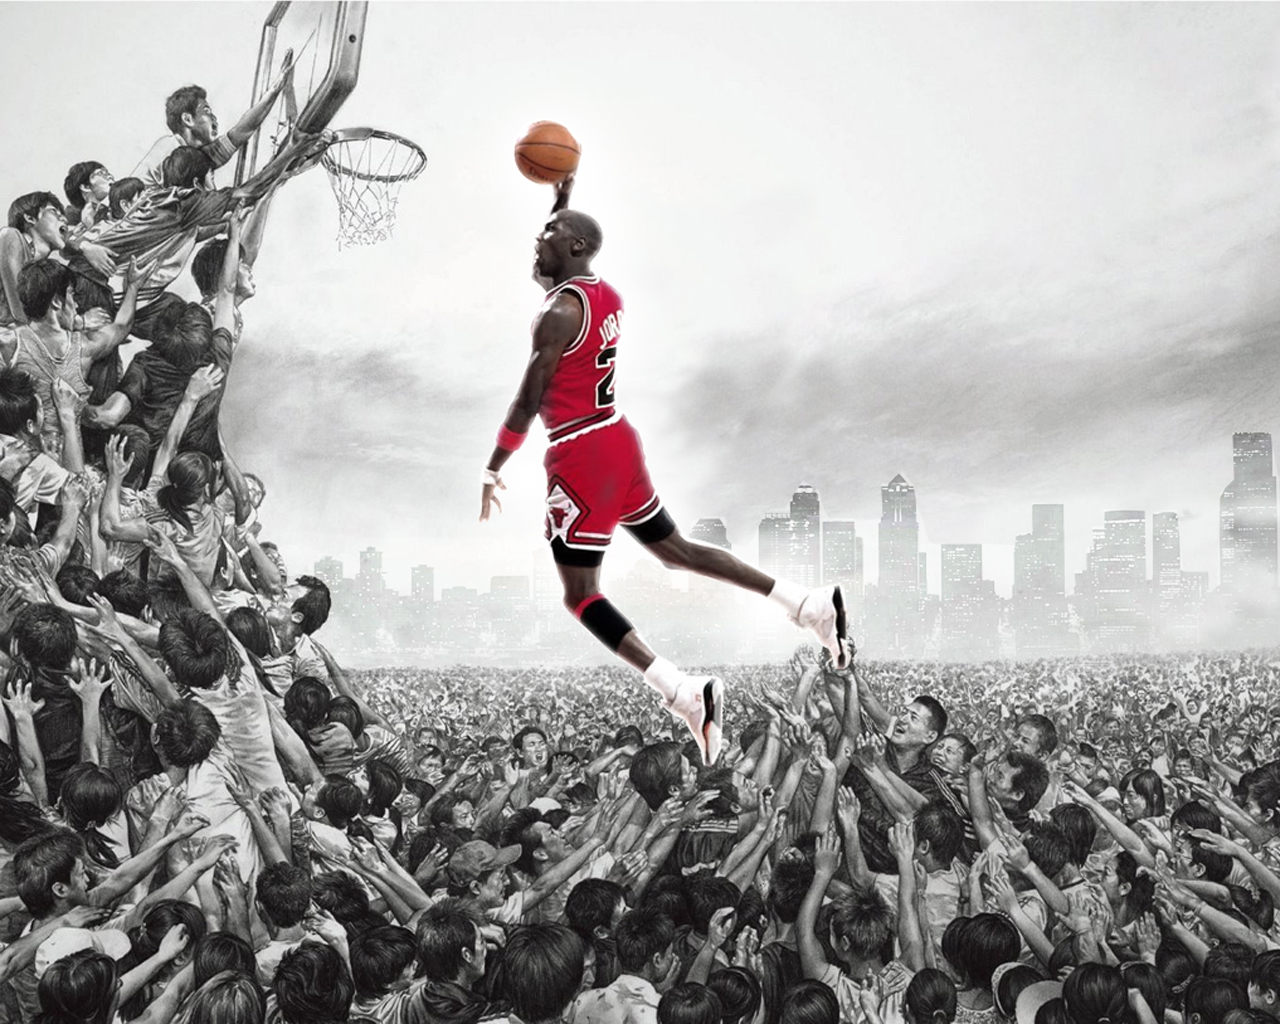 Michael-Jordan-wallpaper.jpg Hd Wallpapers Michael Jordan 1280x1024